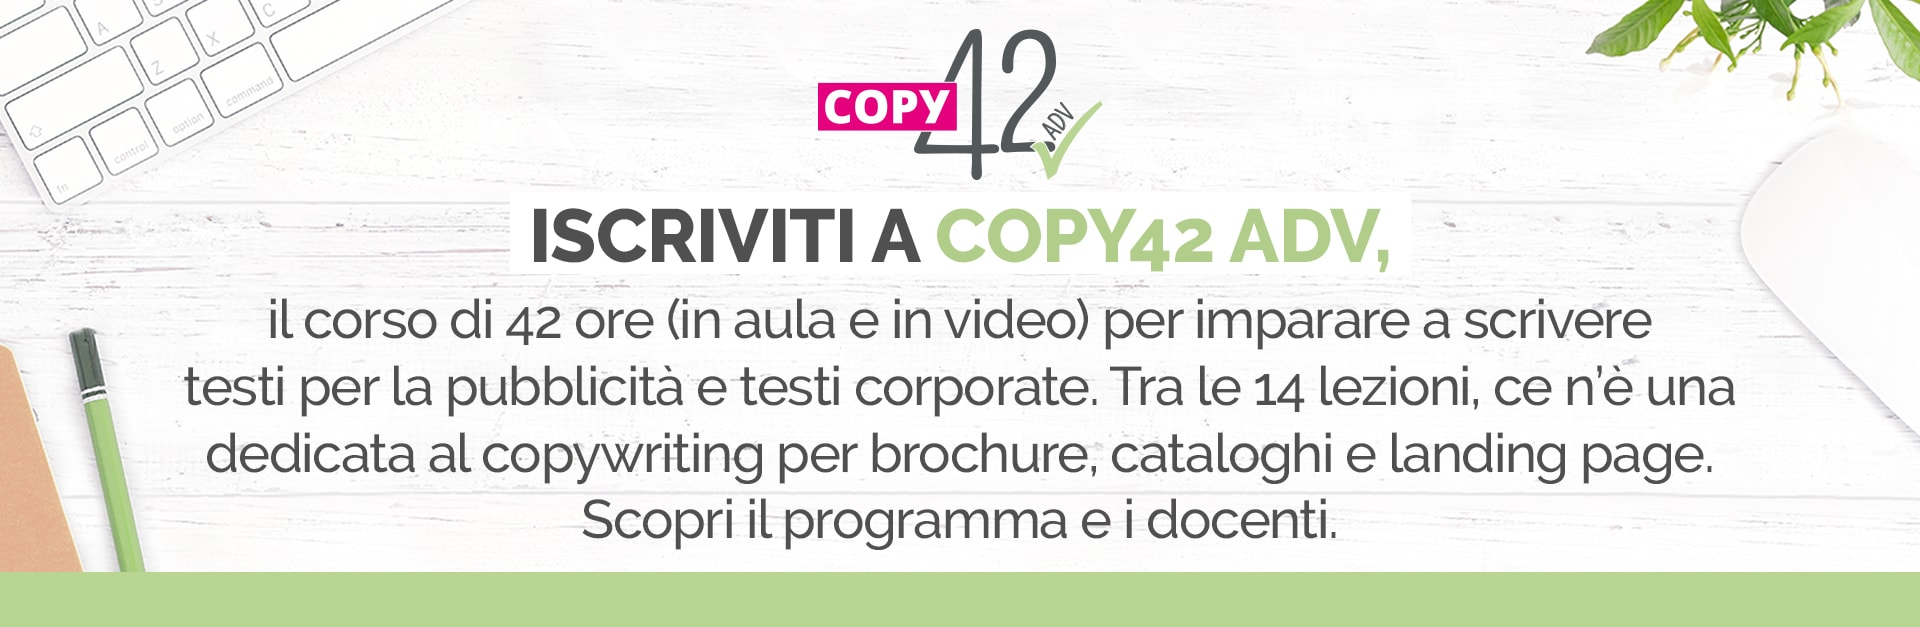 corso copywriting Copy42 ADV